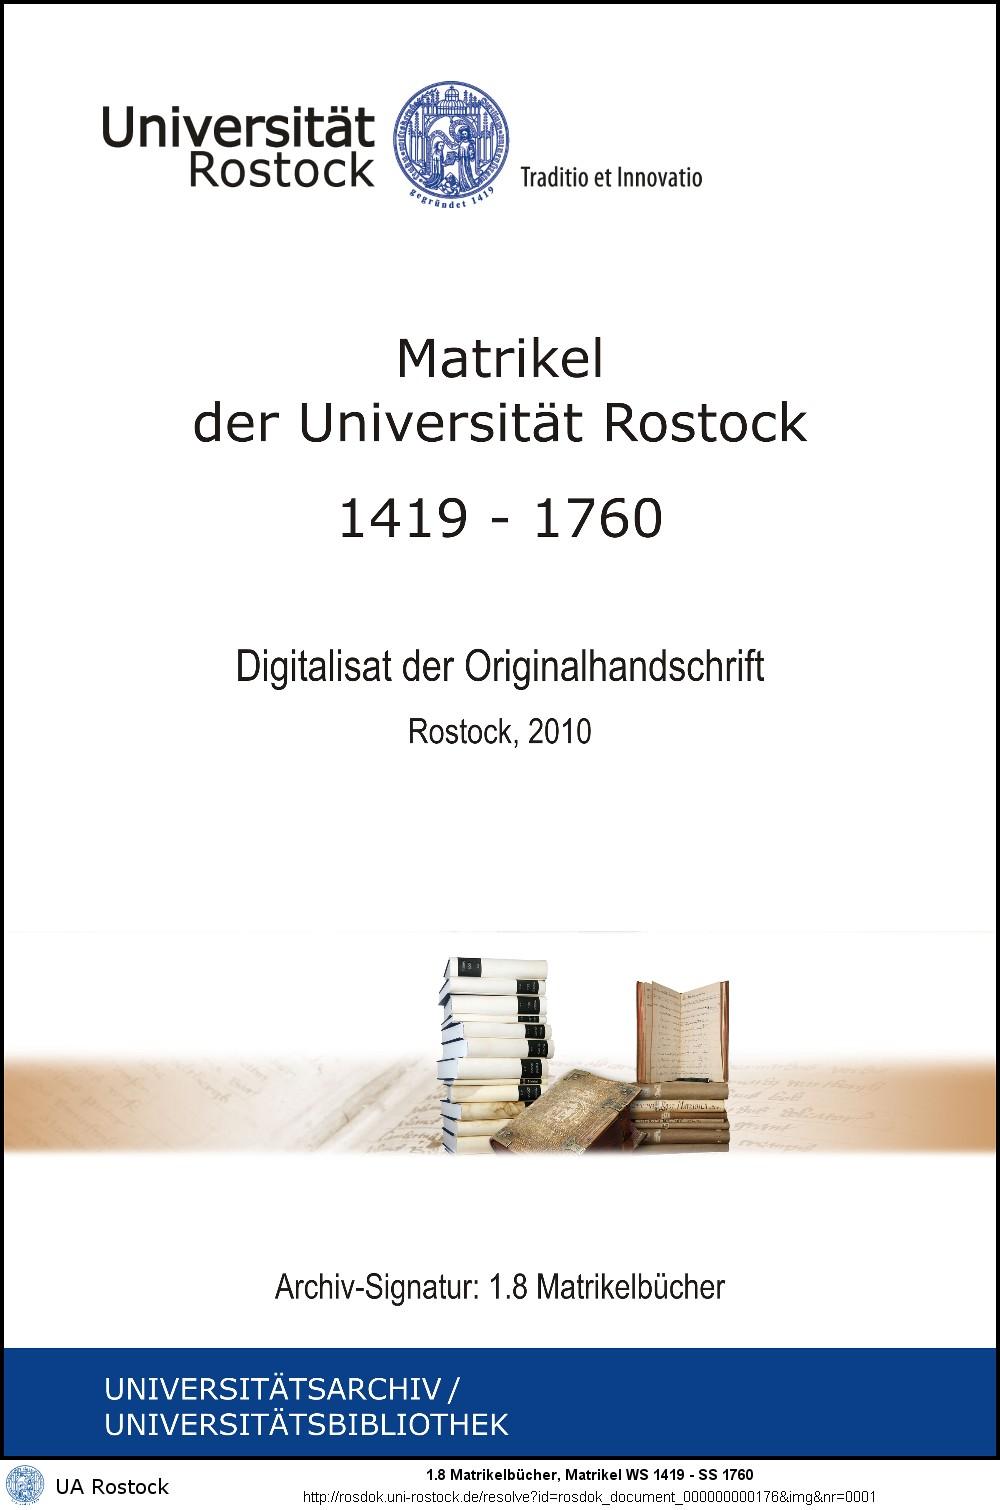 Matrikel der Universität Rostock: 1419 WS - 1760 SS